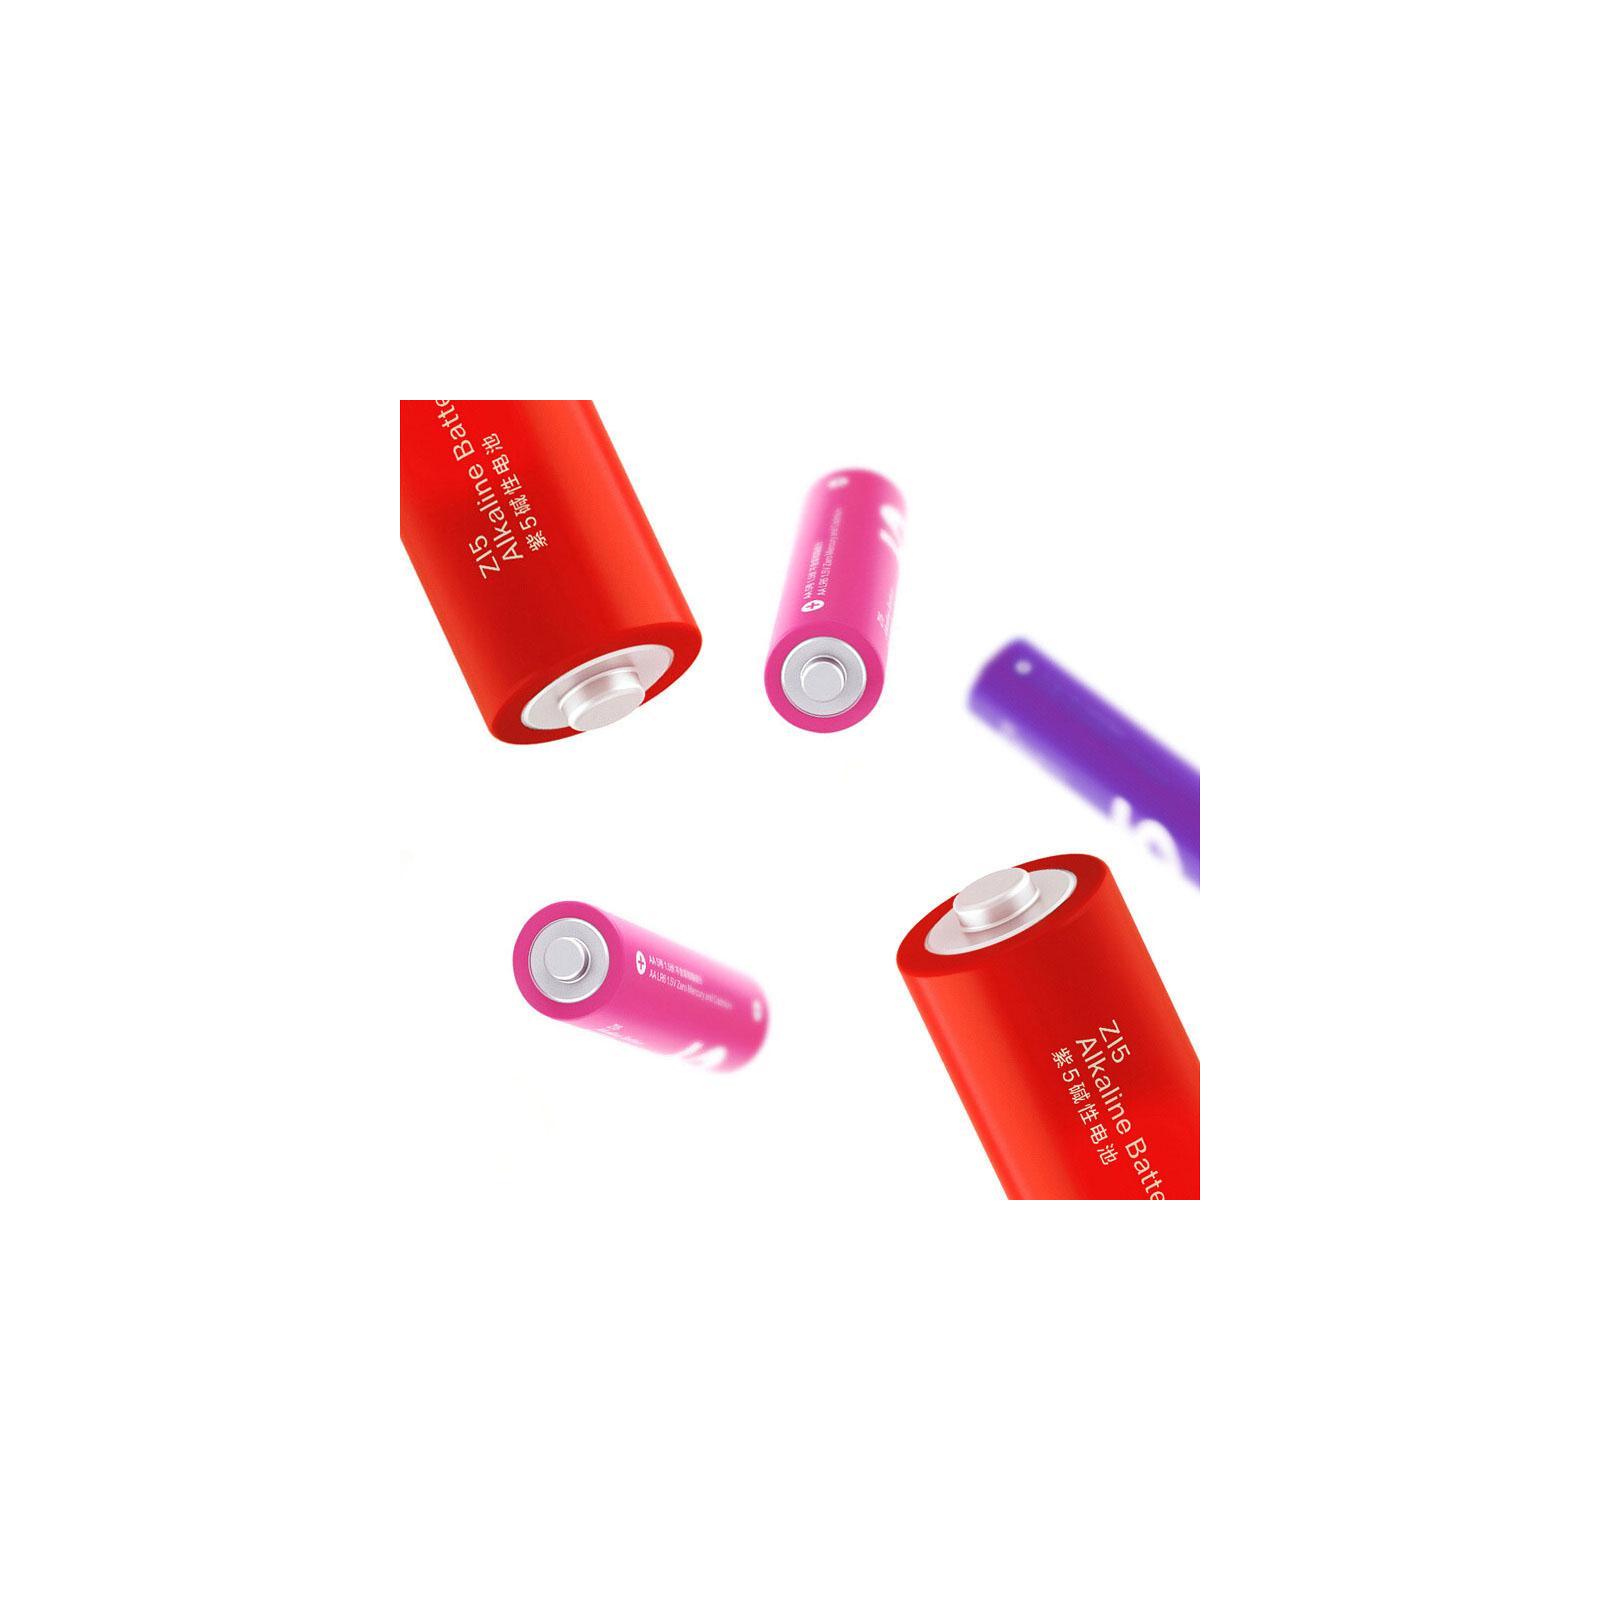 Батарейка ZMI ZI7 Rainbow AAA batteries * 24 (Р30403) изображение 4